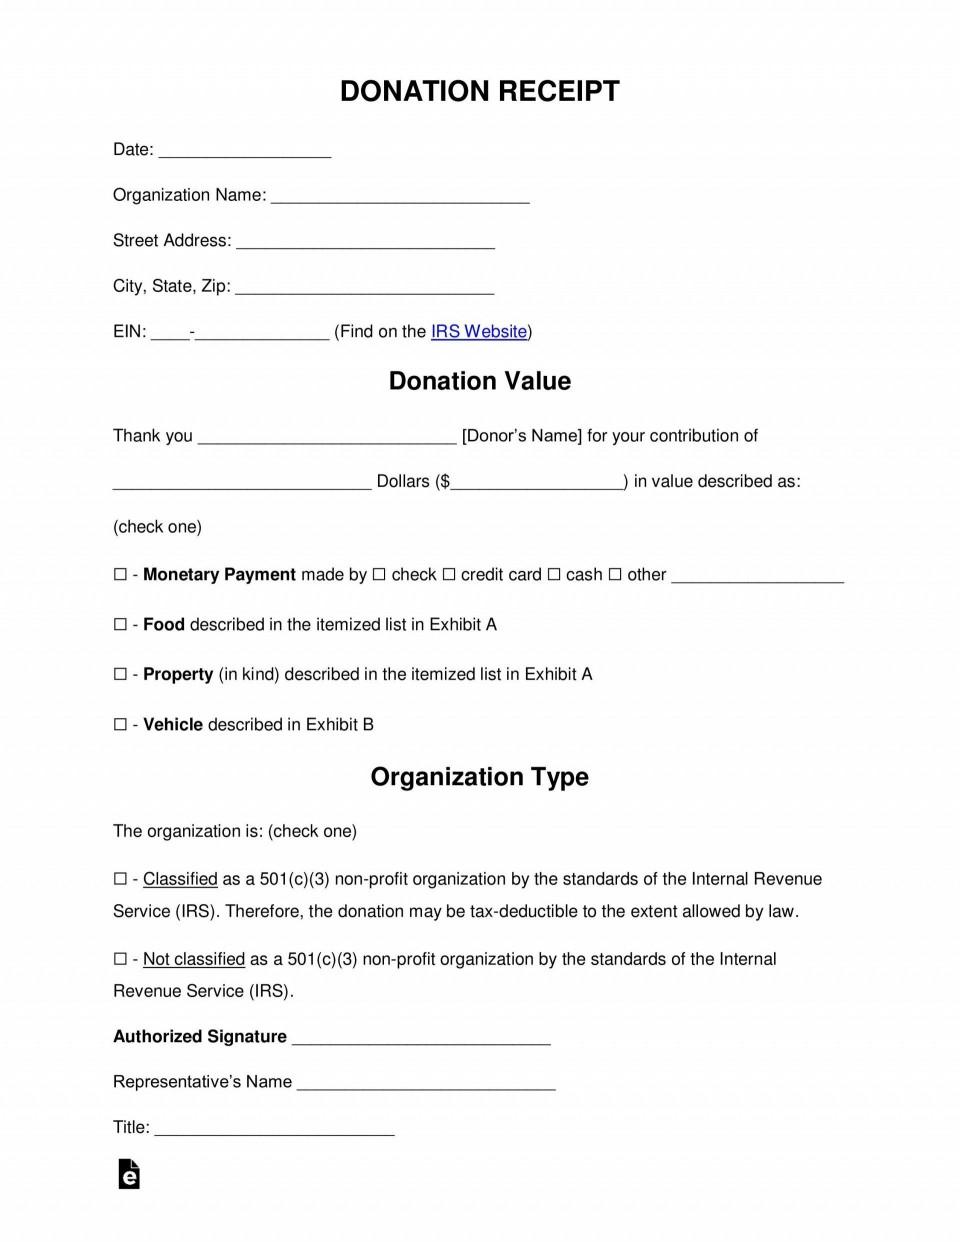 006 Exceptional Tax Deductible Donation Receipt Template Australia Inspiration 960